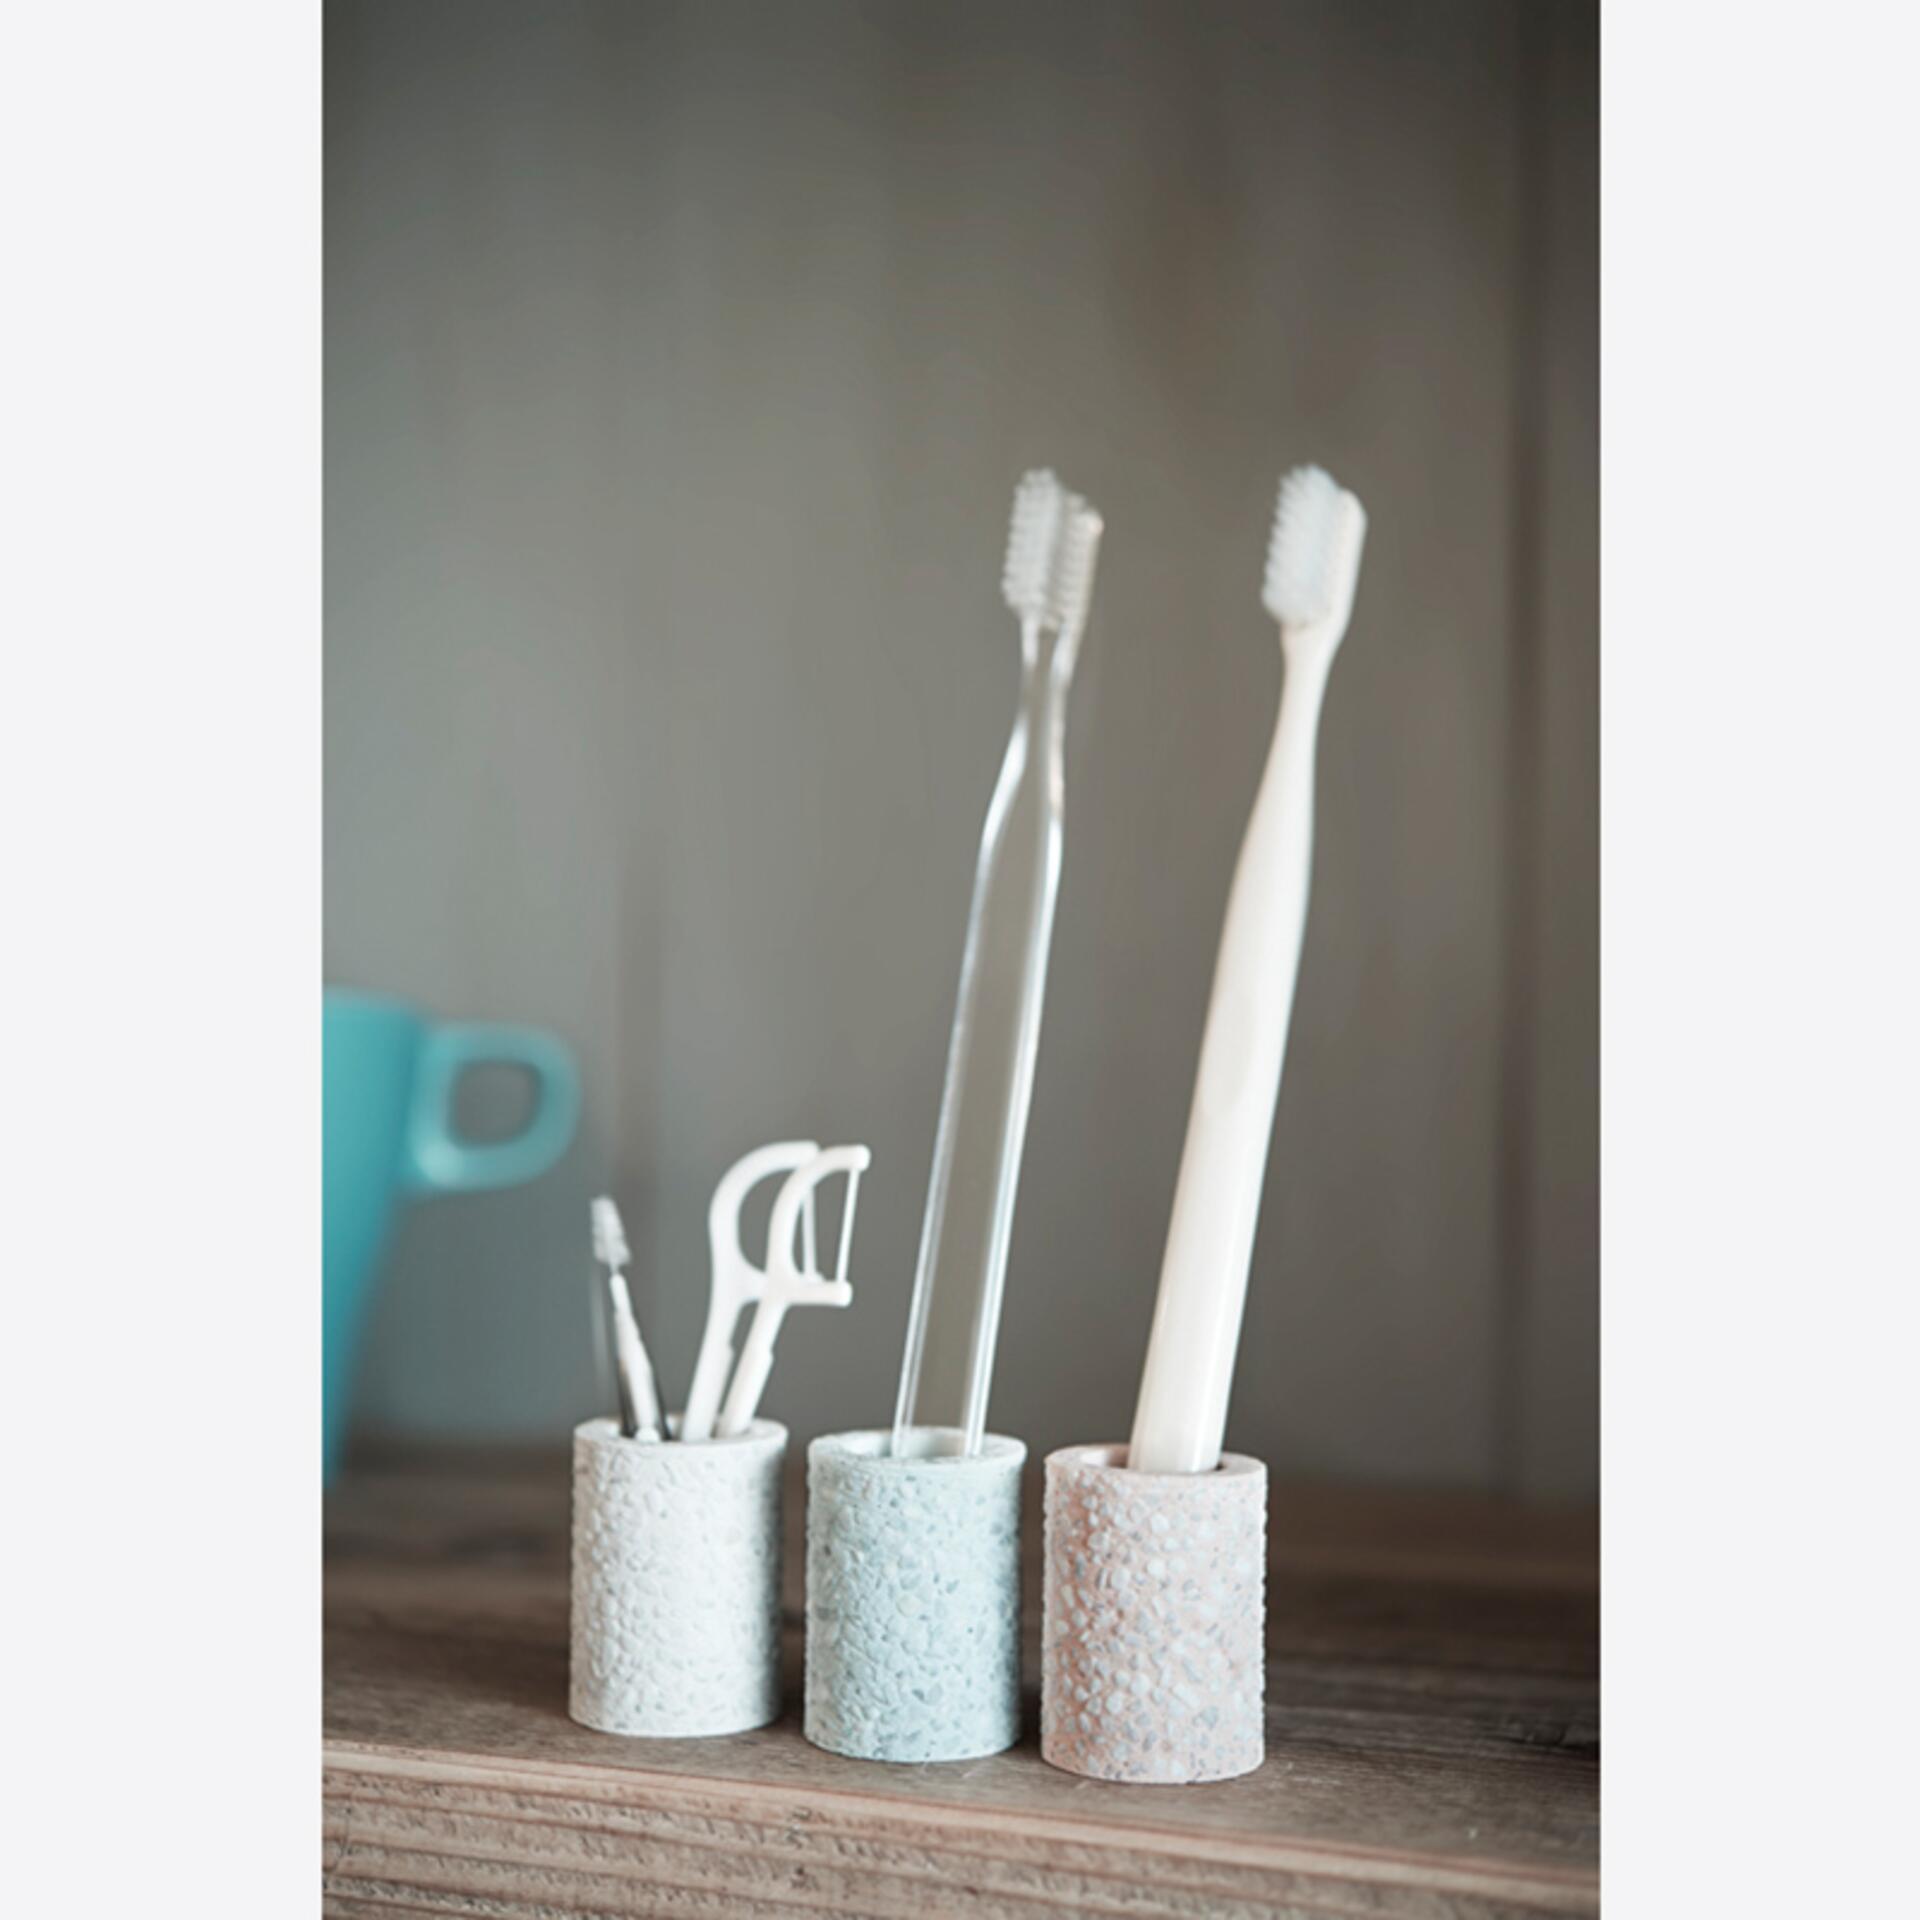 Soil Zahnbürstenhalter Mini Weiß